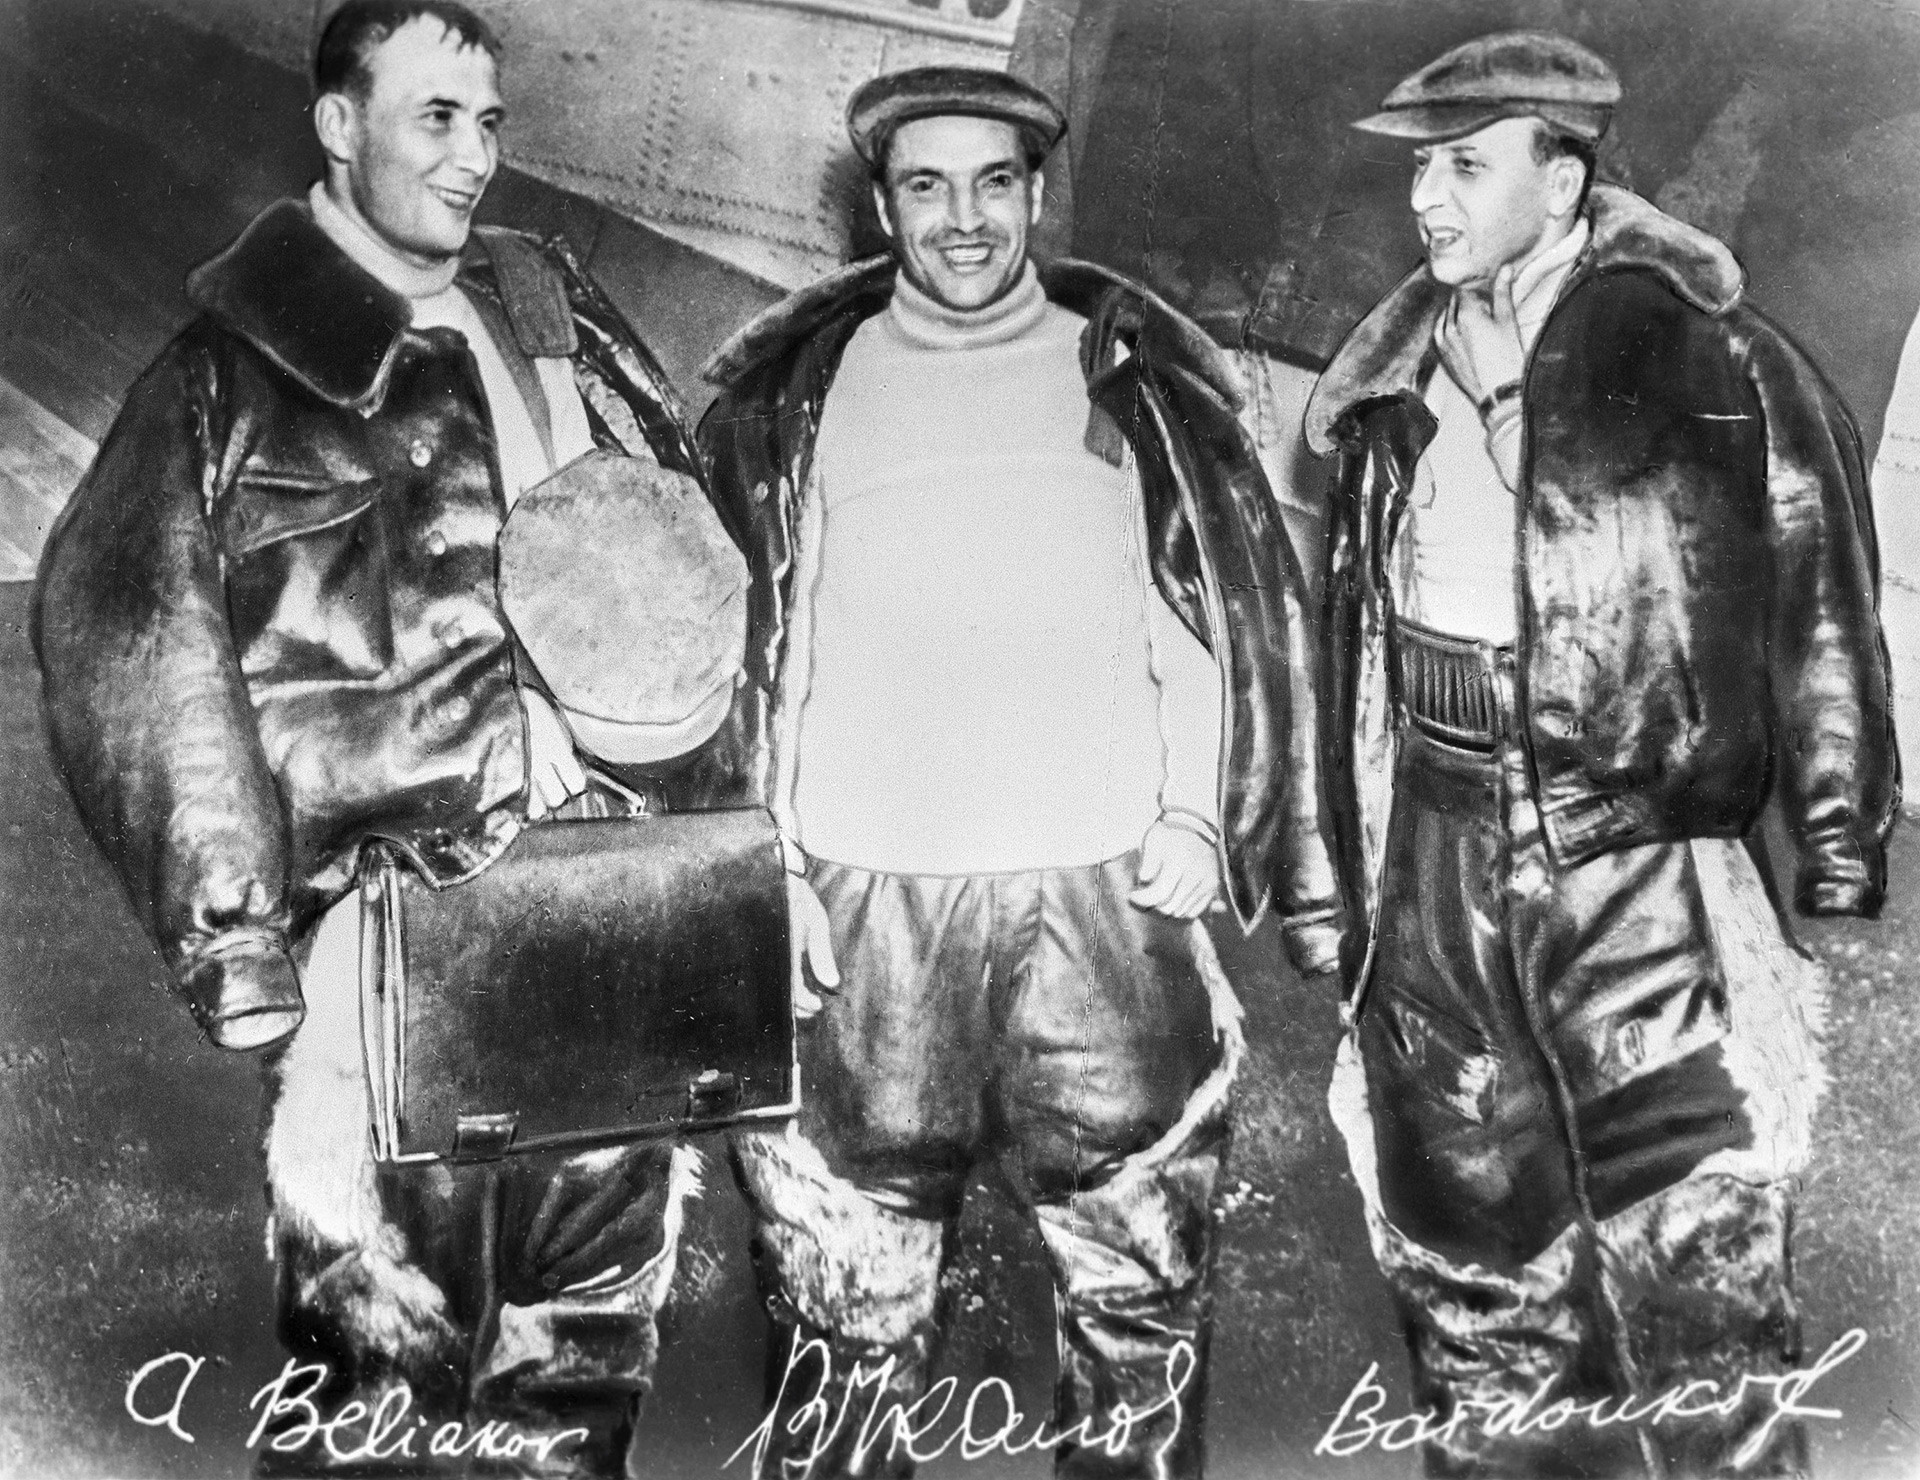 Alexander Beljakow, Waleri Tschkalow und Georgi Baidukow